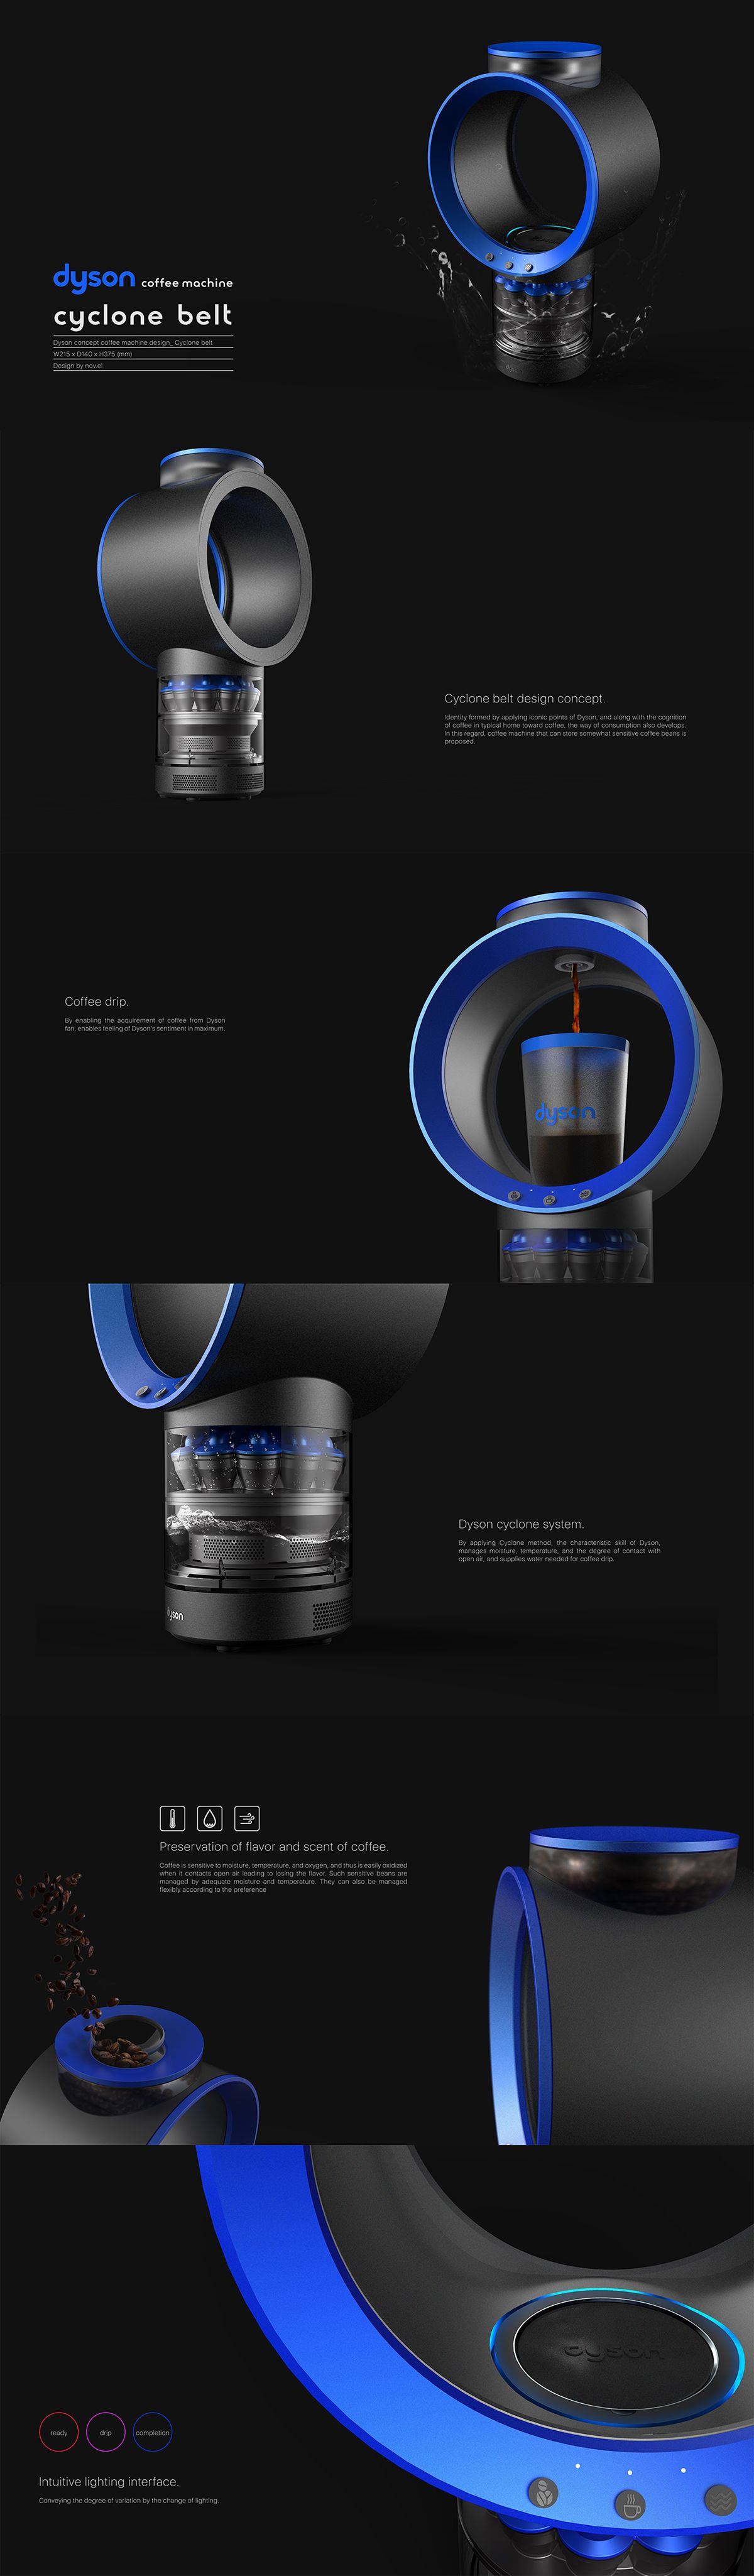 Product design / Industrial design / 제품디자인 / 산업디자인 / coffee machine / dyson…